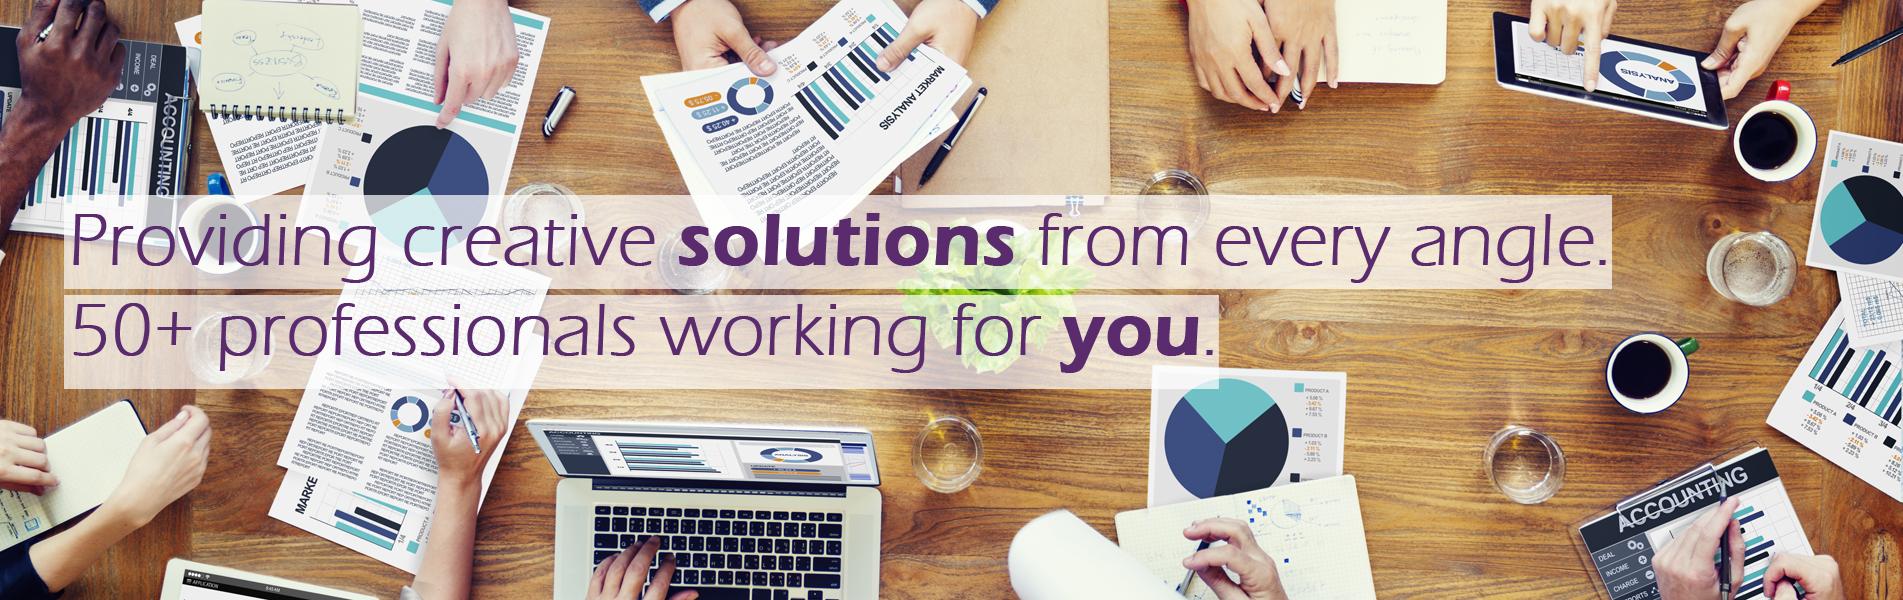 Eshel_Banner_Solutions.jpg